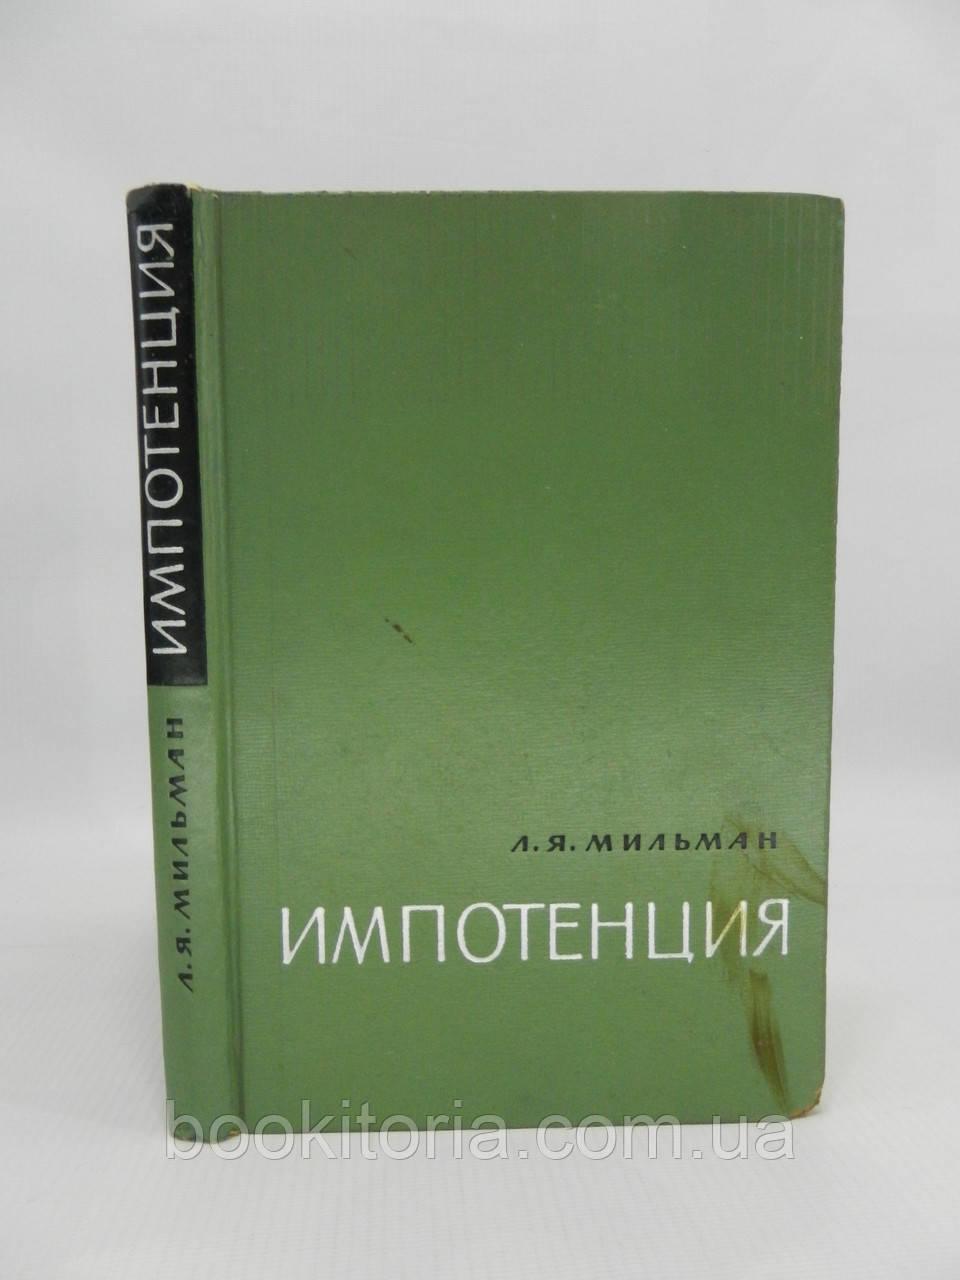 Мильман Л. Импотенция (б/у).